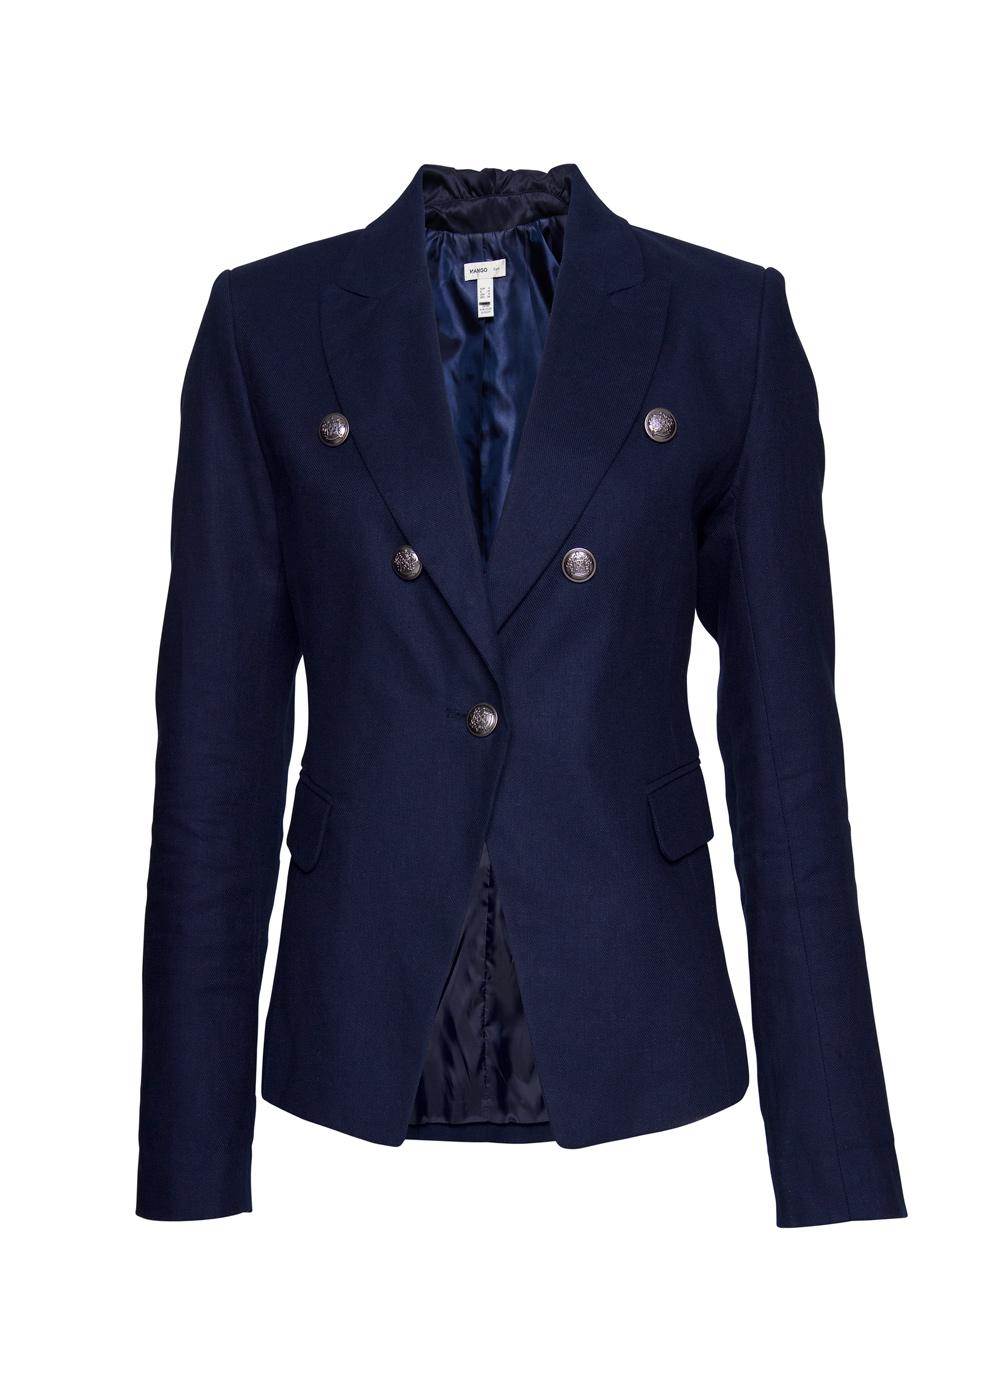 Mango jackets for women